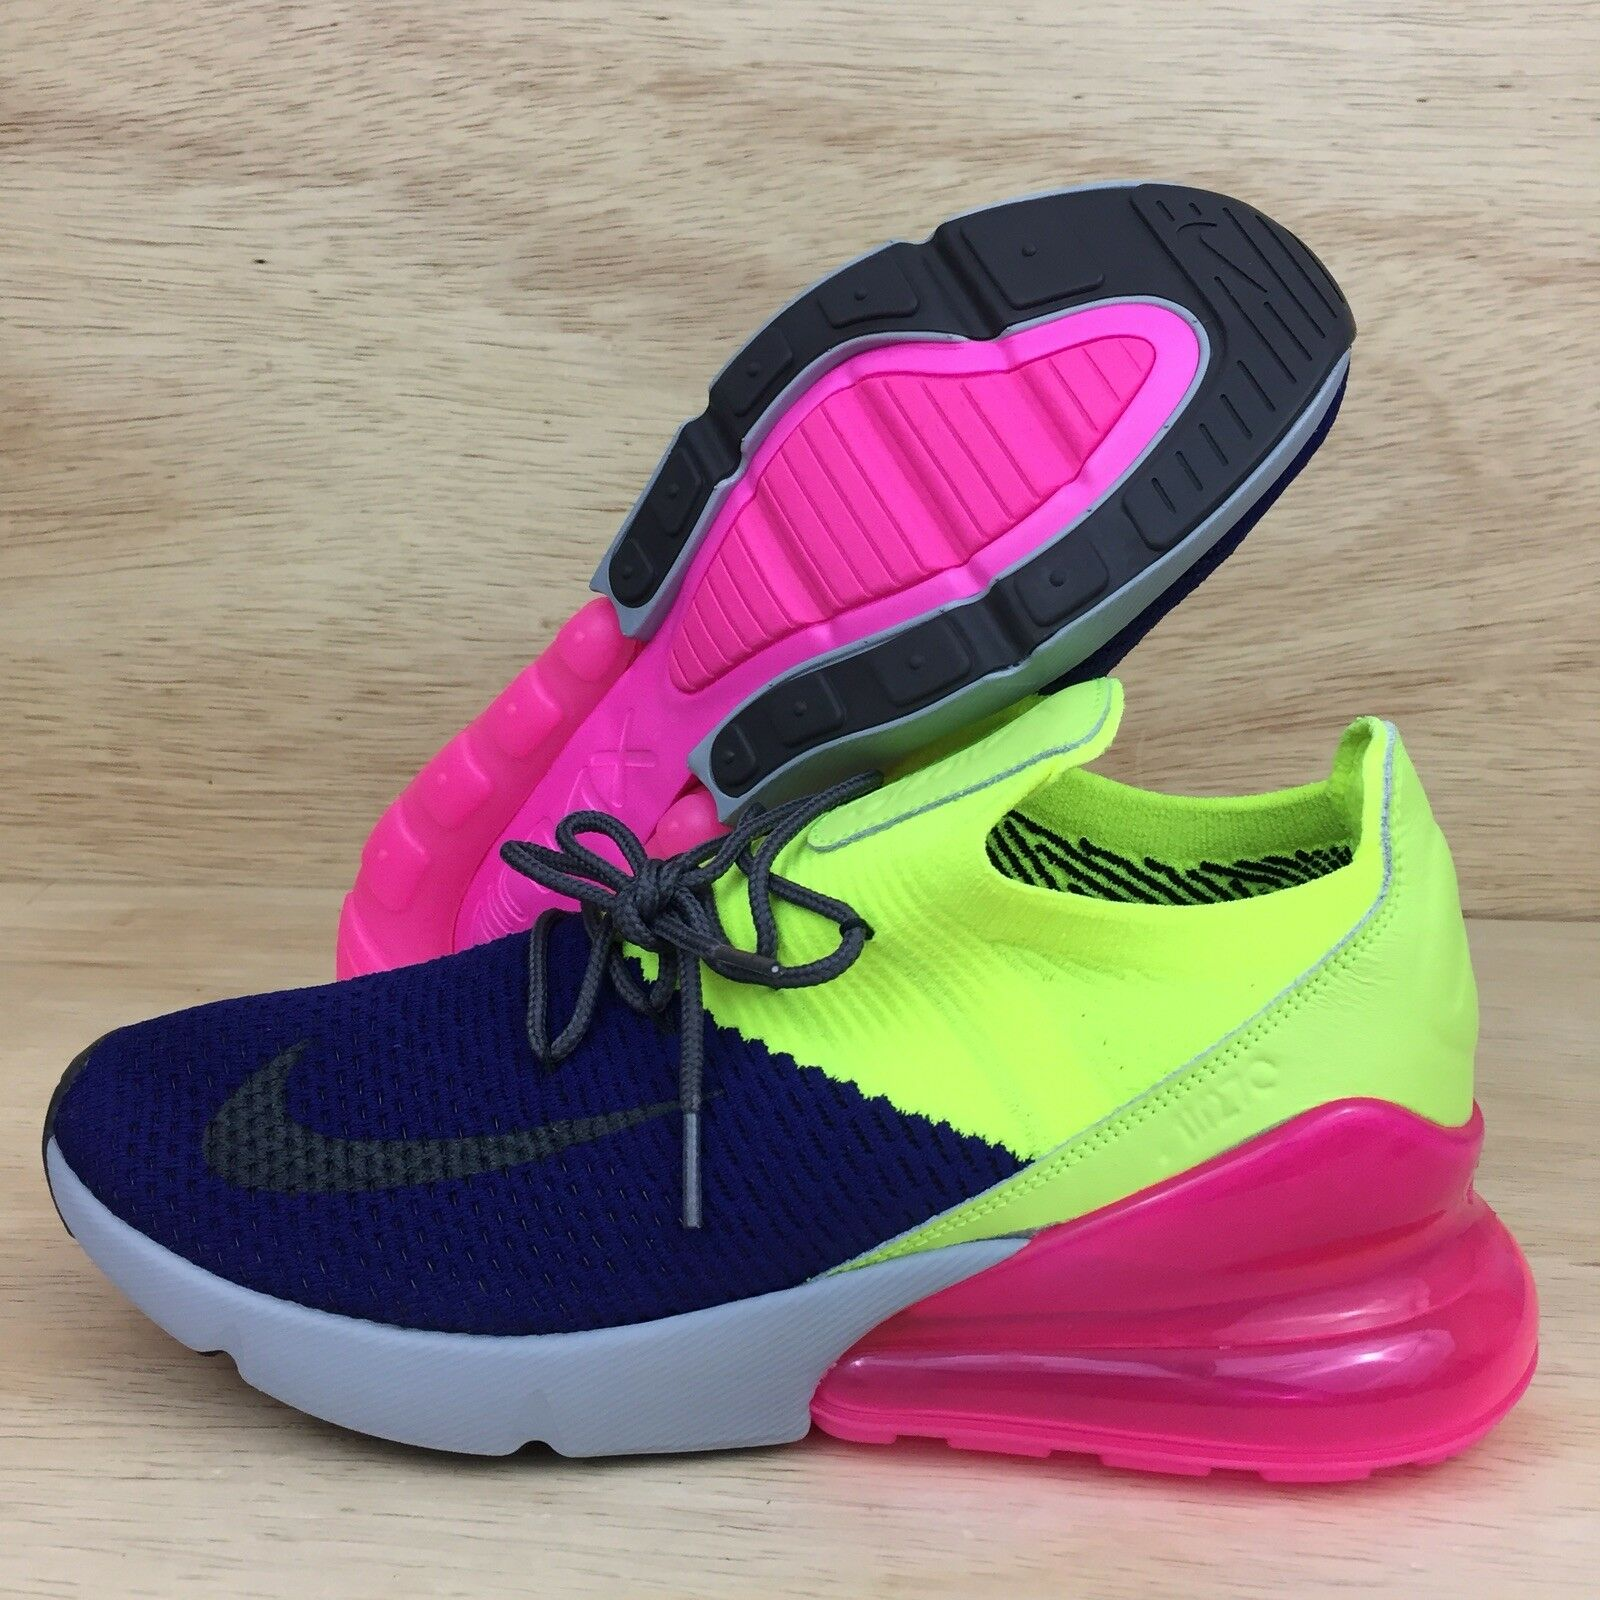 Nike Air Max 270 Flyknit Regency Purple Grey Volt AO1023-501 Men's Size 9.5 New